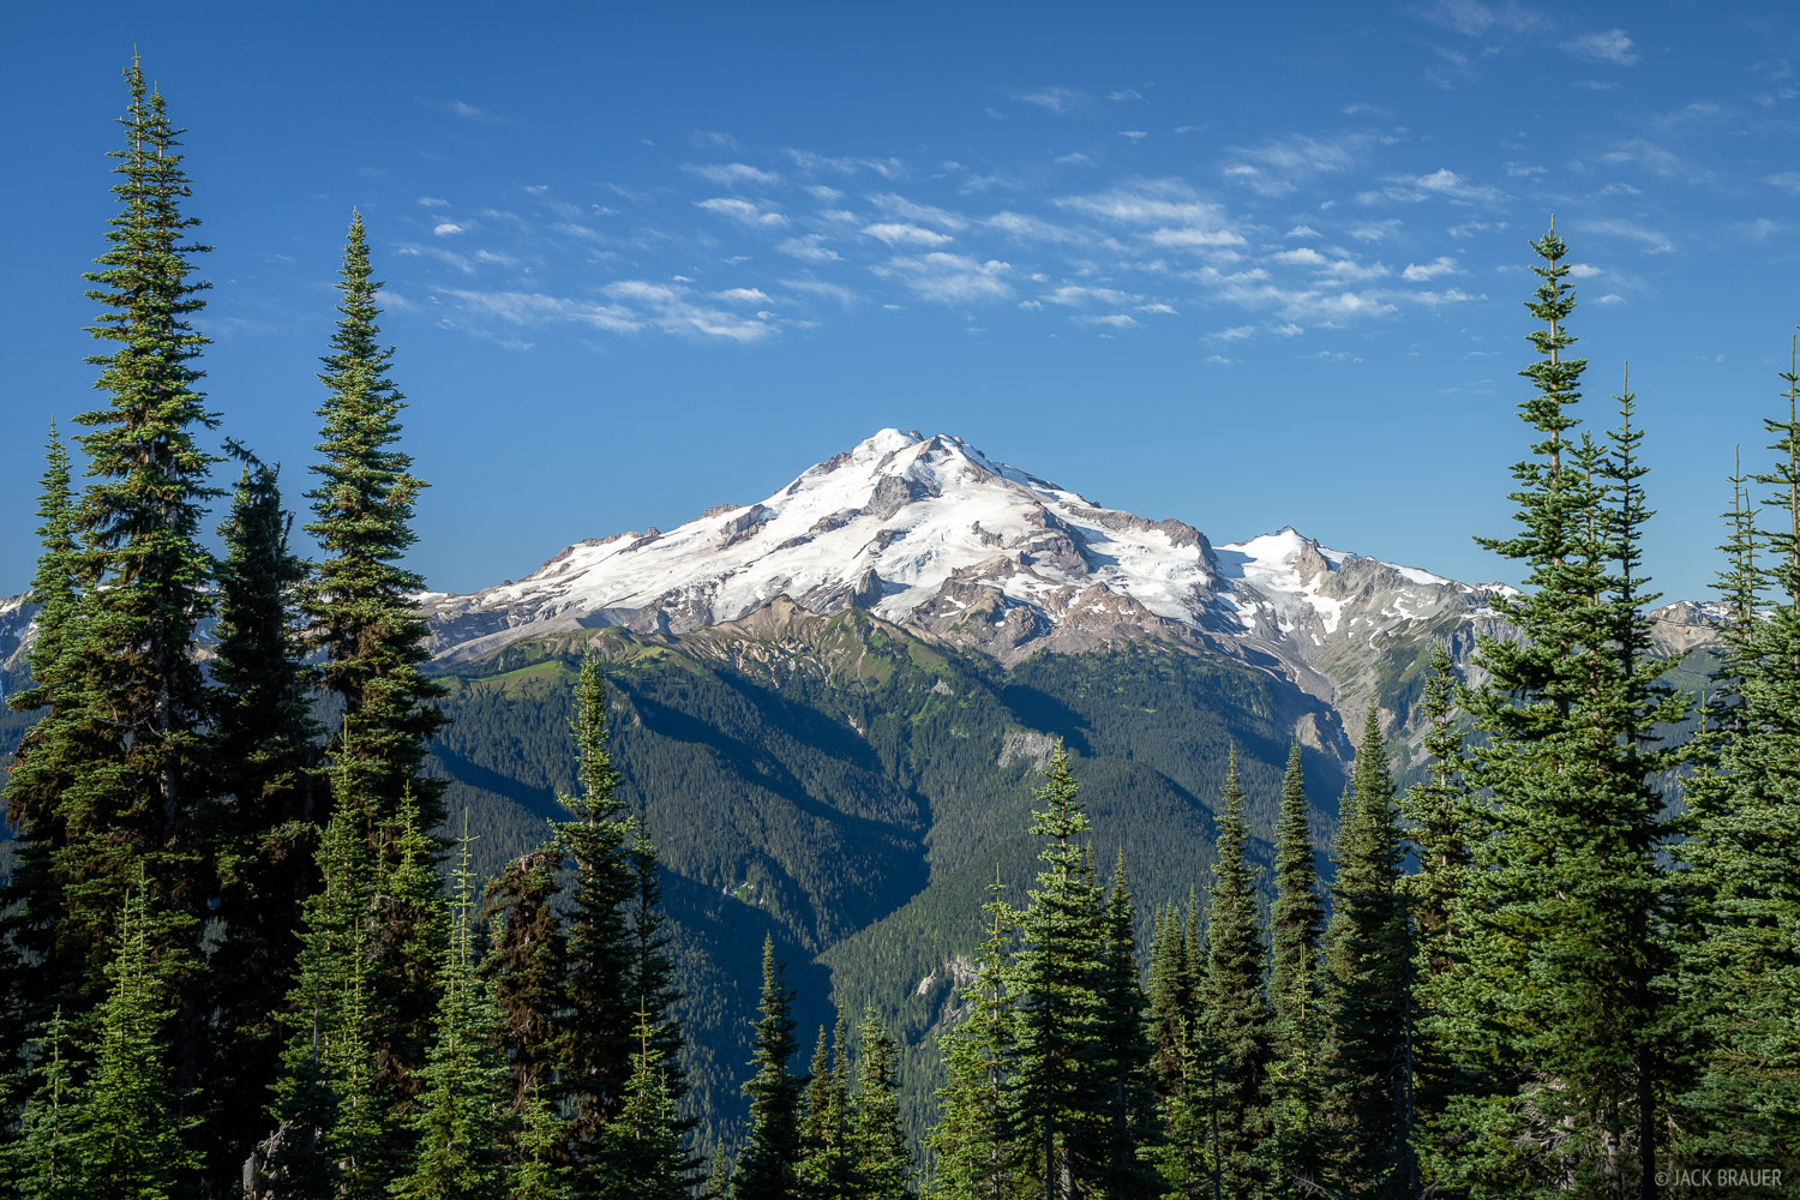 Glacier Peak on a clear blue sky day.